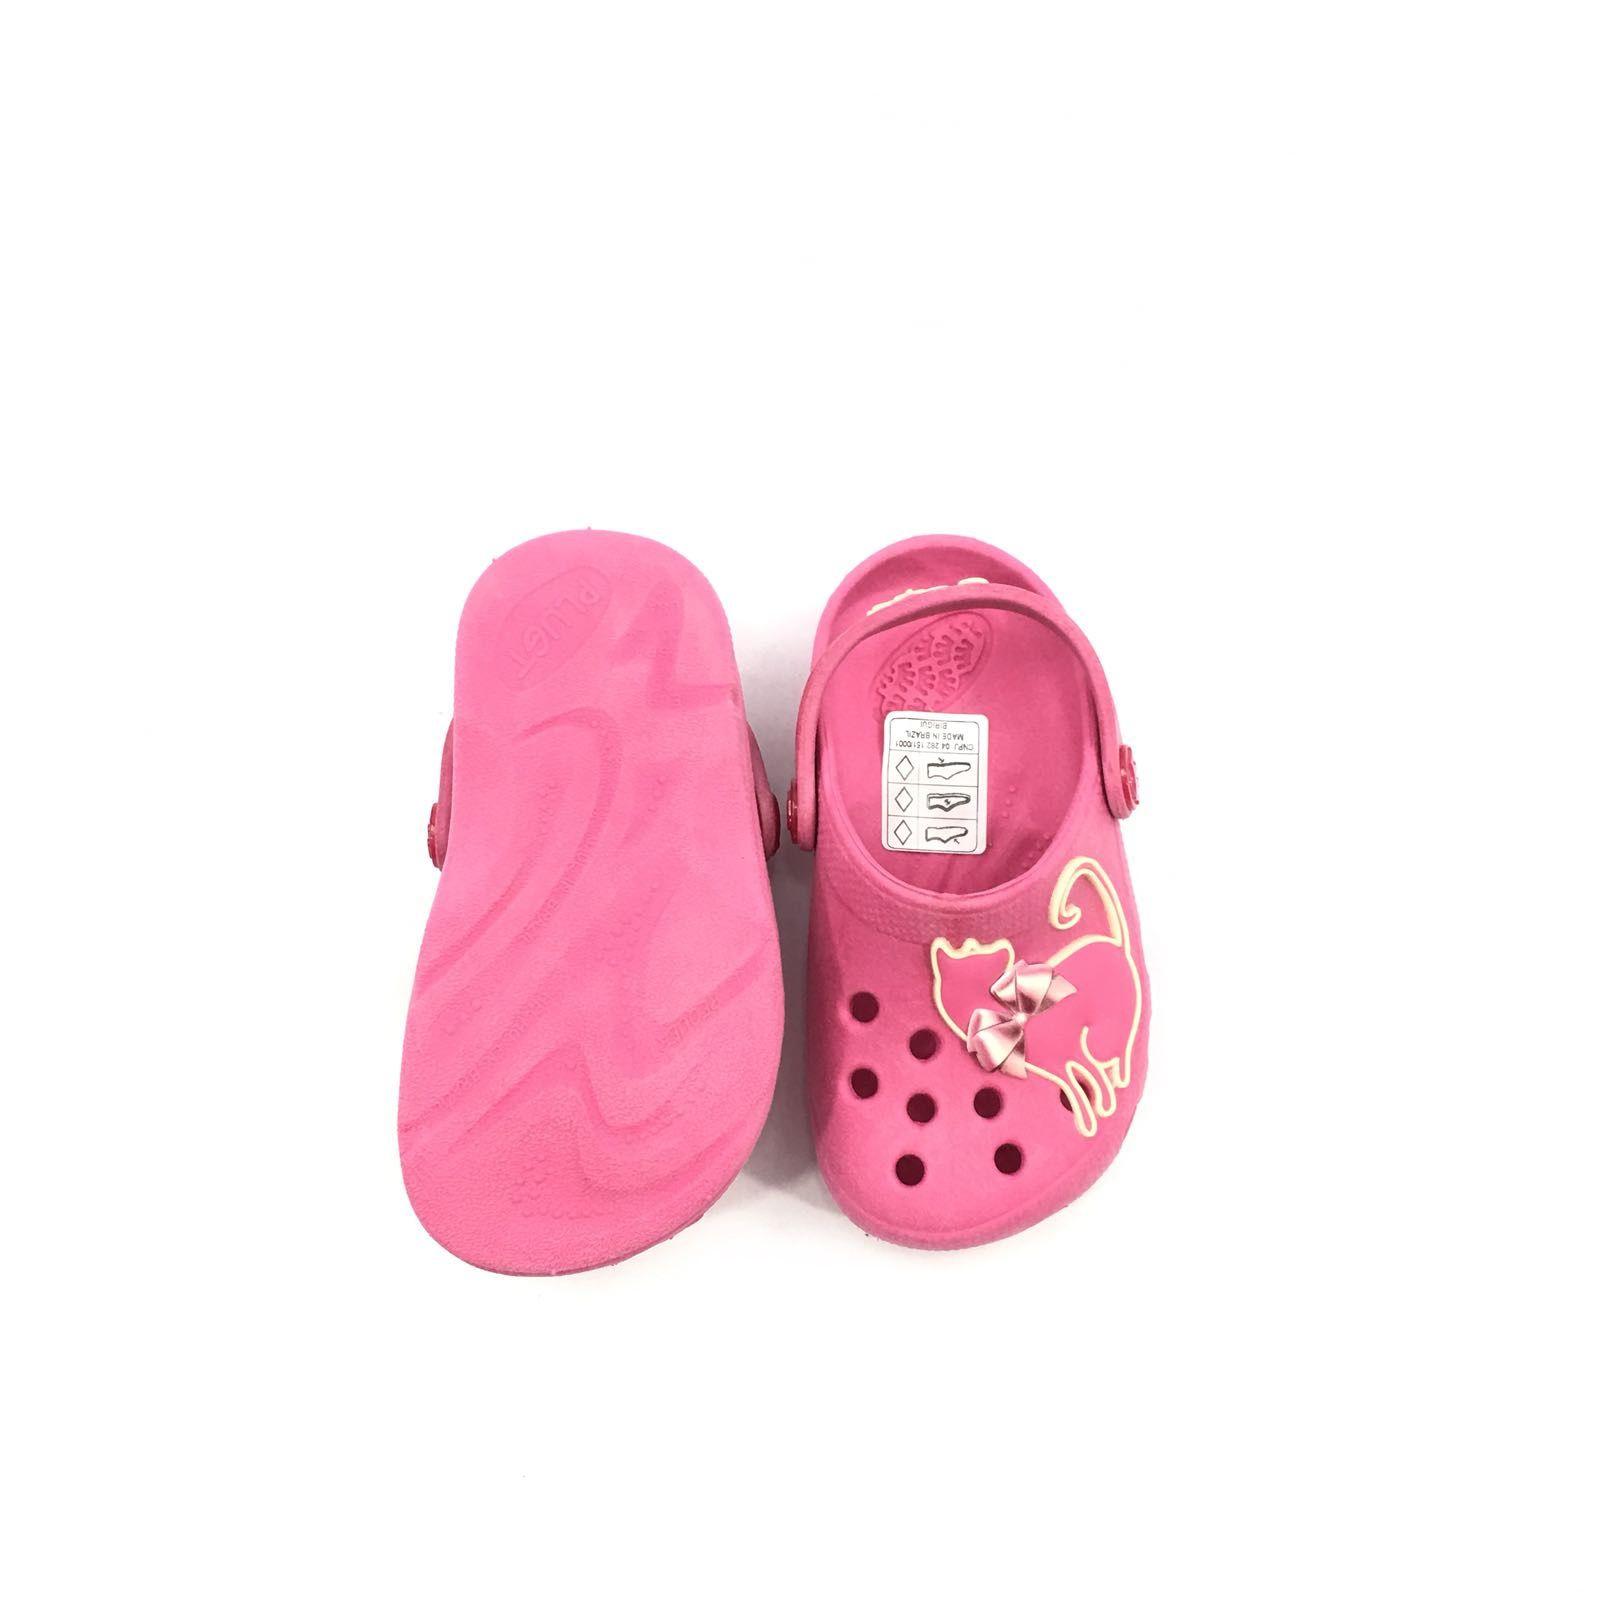 5cbc3bb2fb sandalia crocs infantil rosa babuche Feminina Plugt